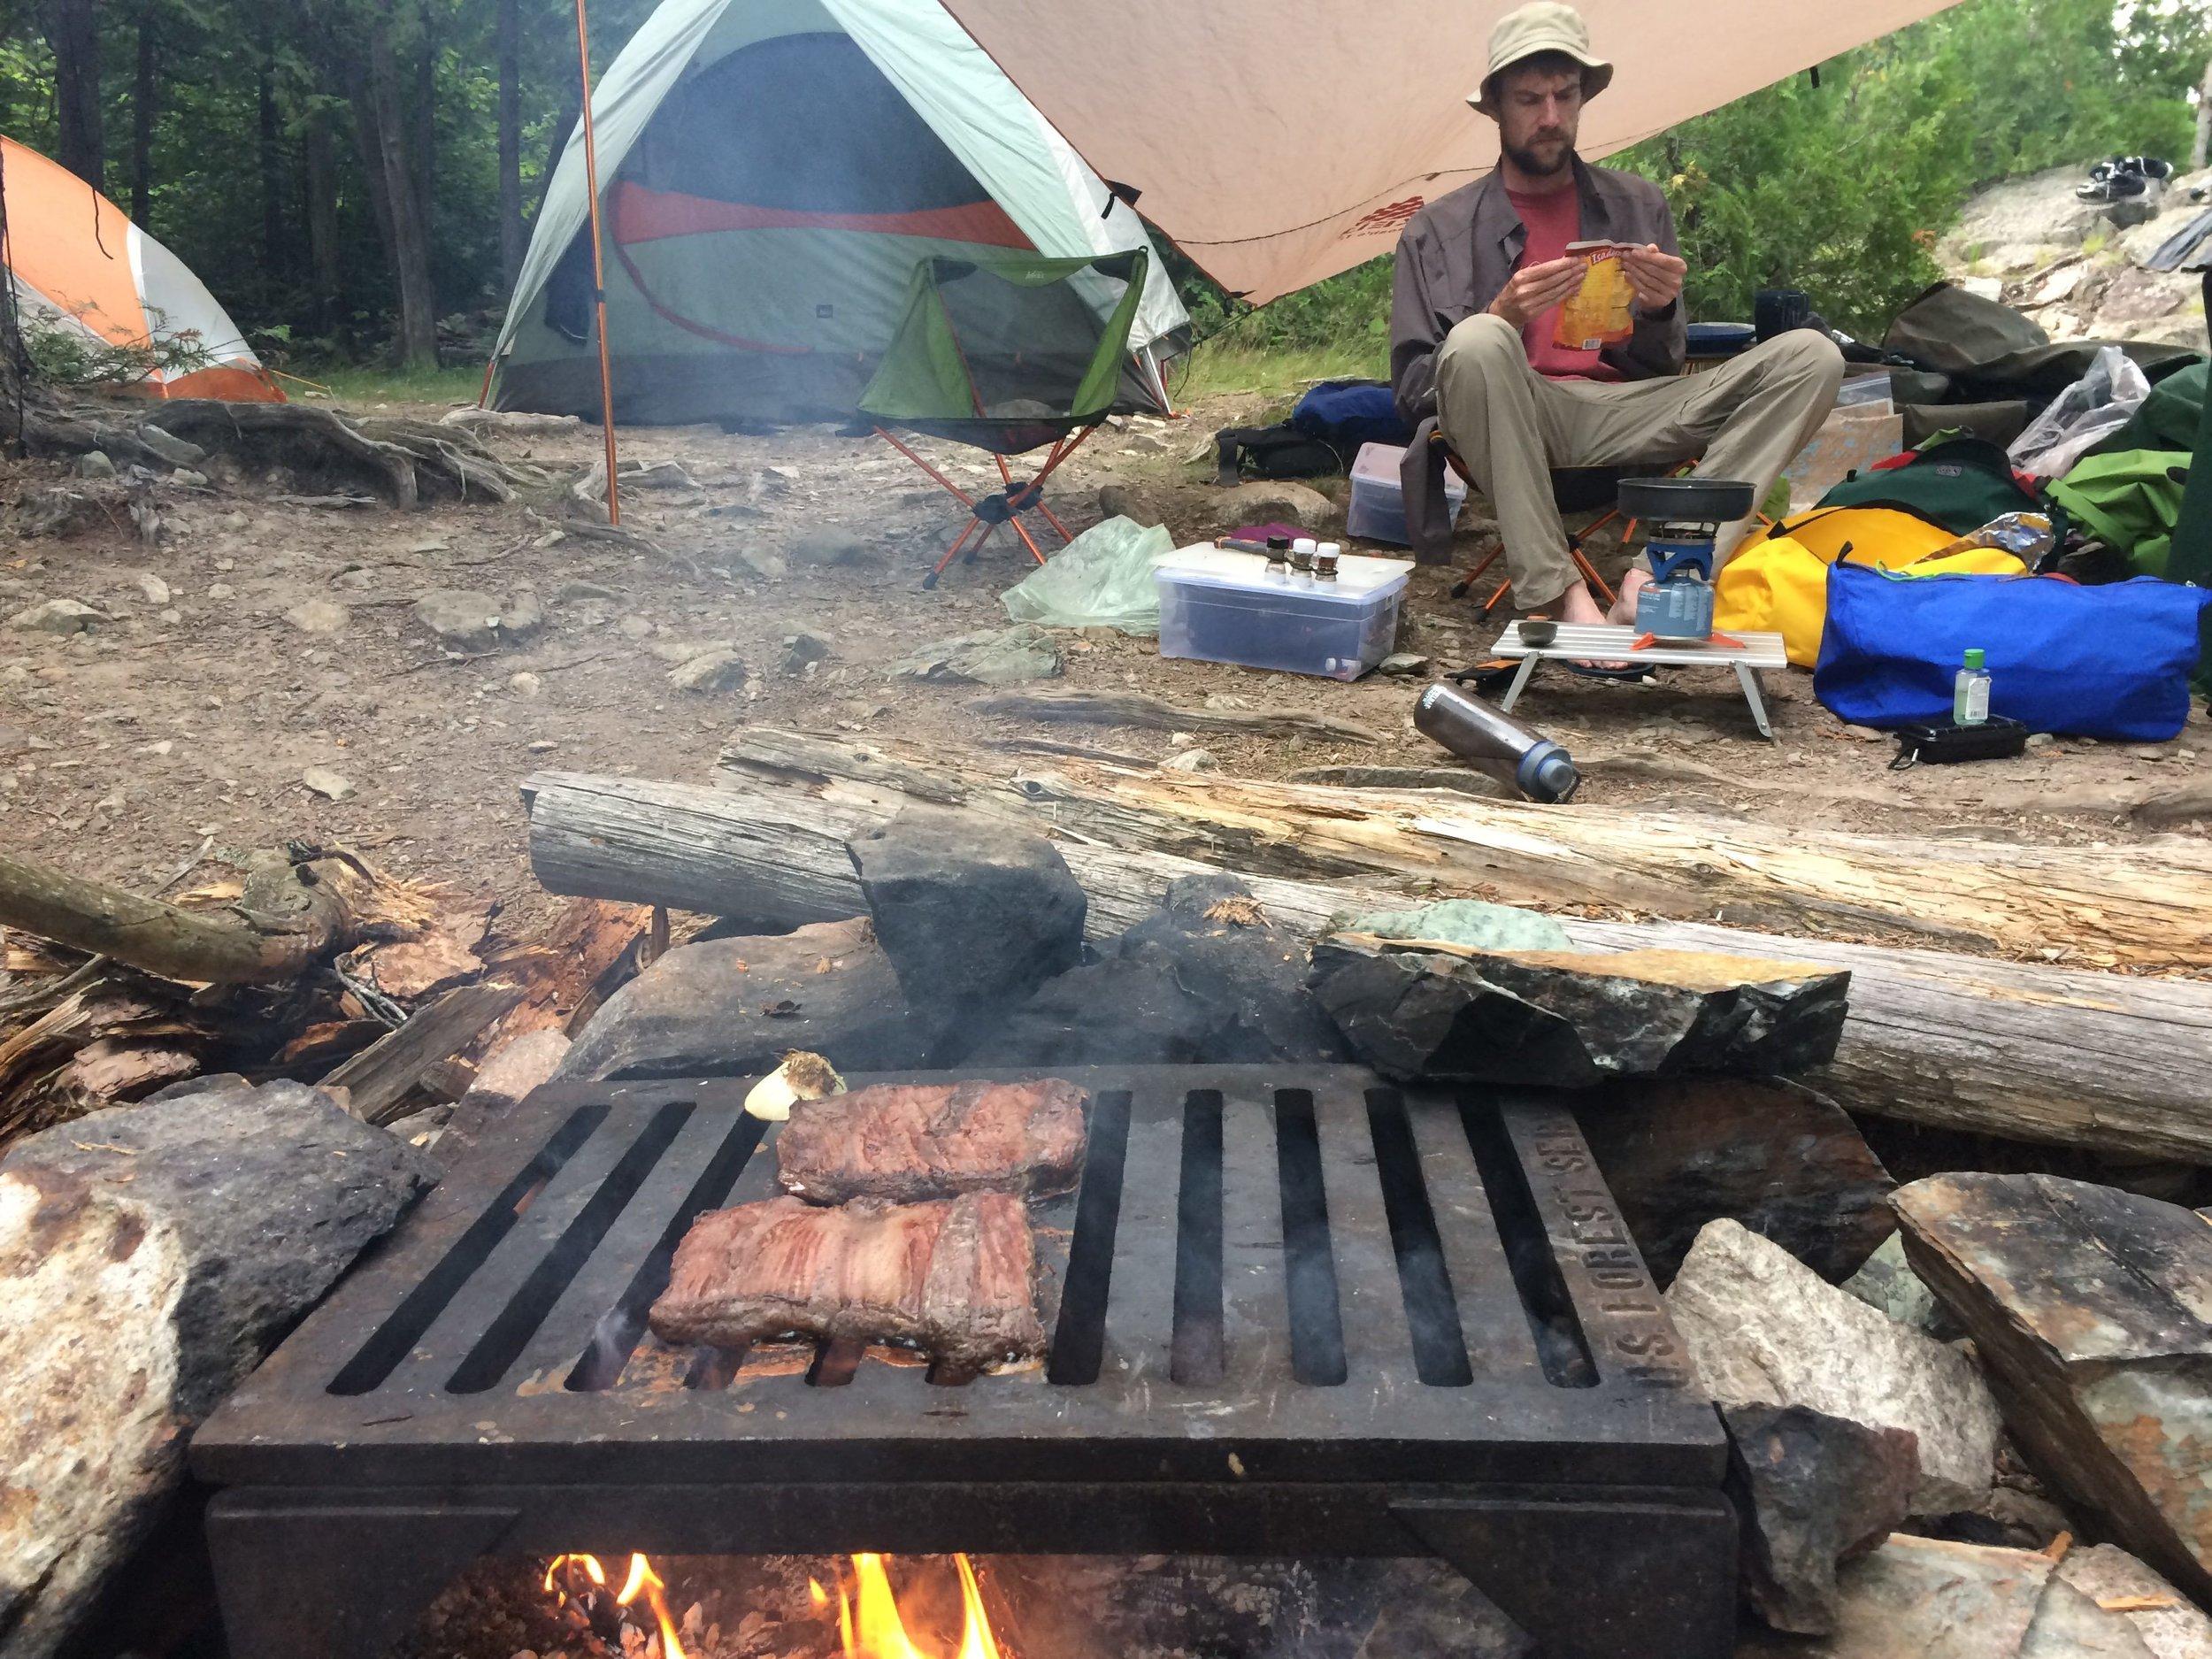 Flank steak camping